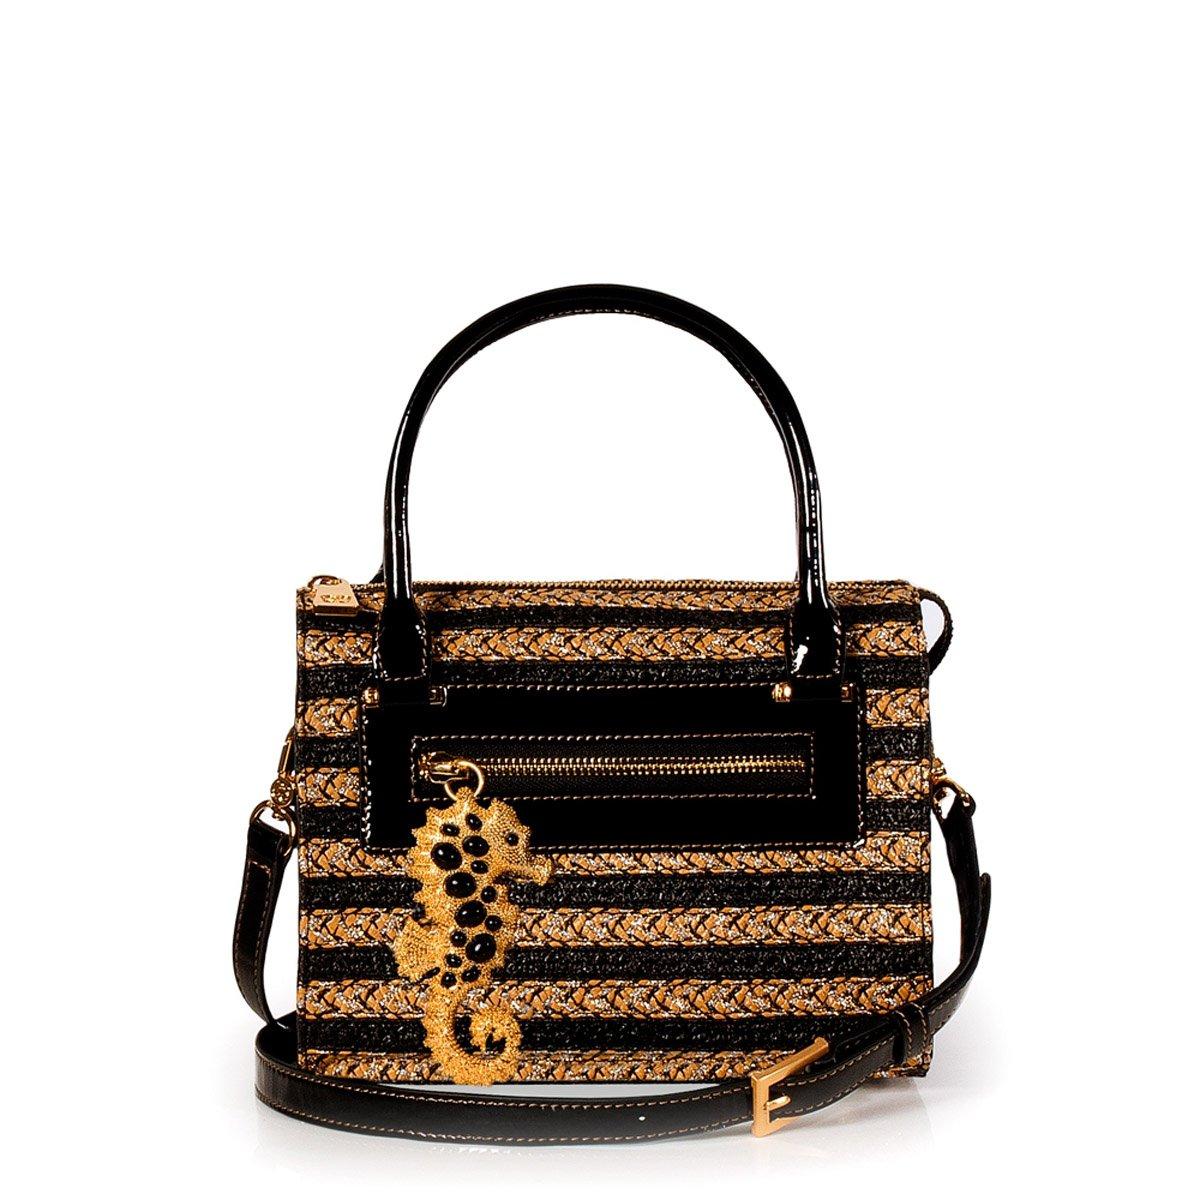 Eric Javits Luxury Fashion Designer Women's Handbag - Rio - Sulfate/Black